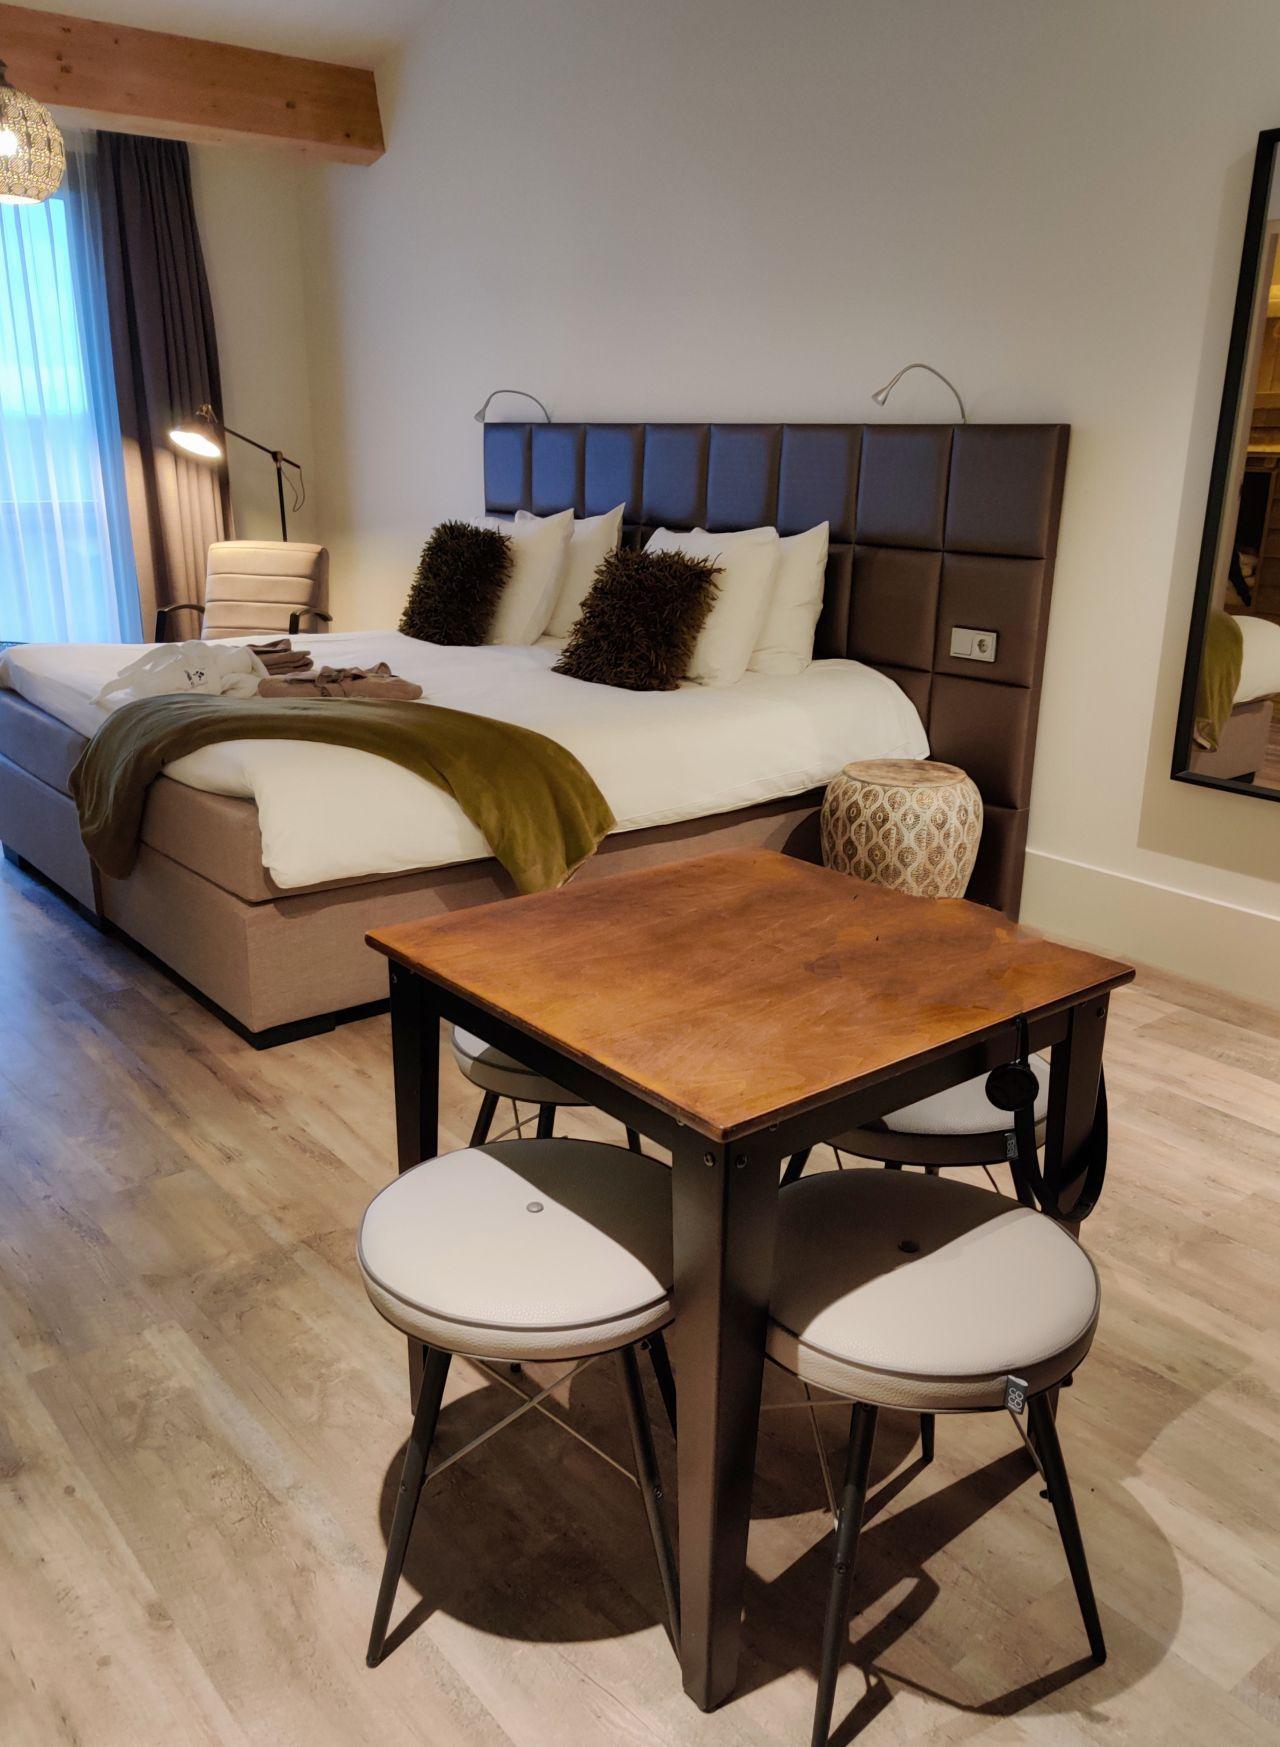 Fruitpark Hotel Spa Ochten luxe familiekamer3